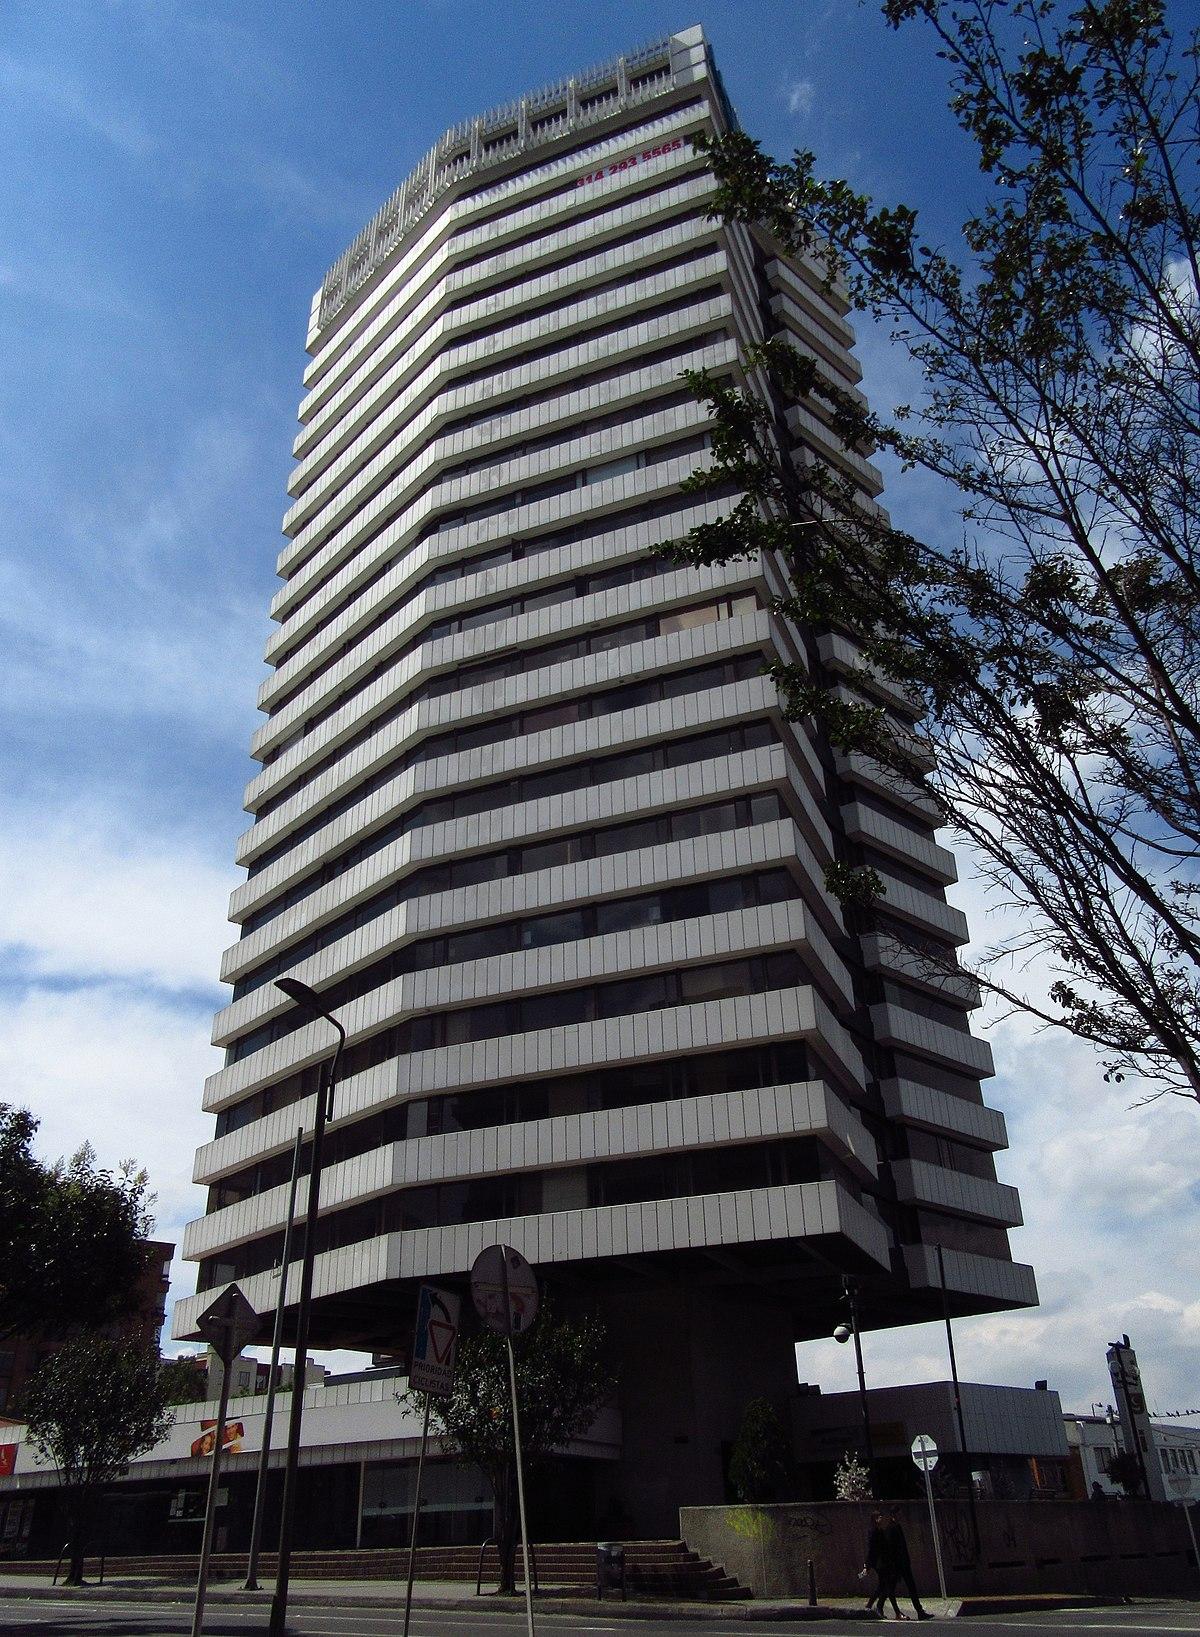 Edificio UGI  Wikipedia la enciclopedia libre